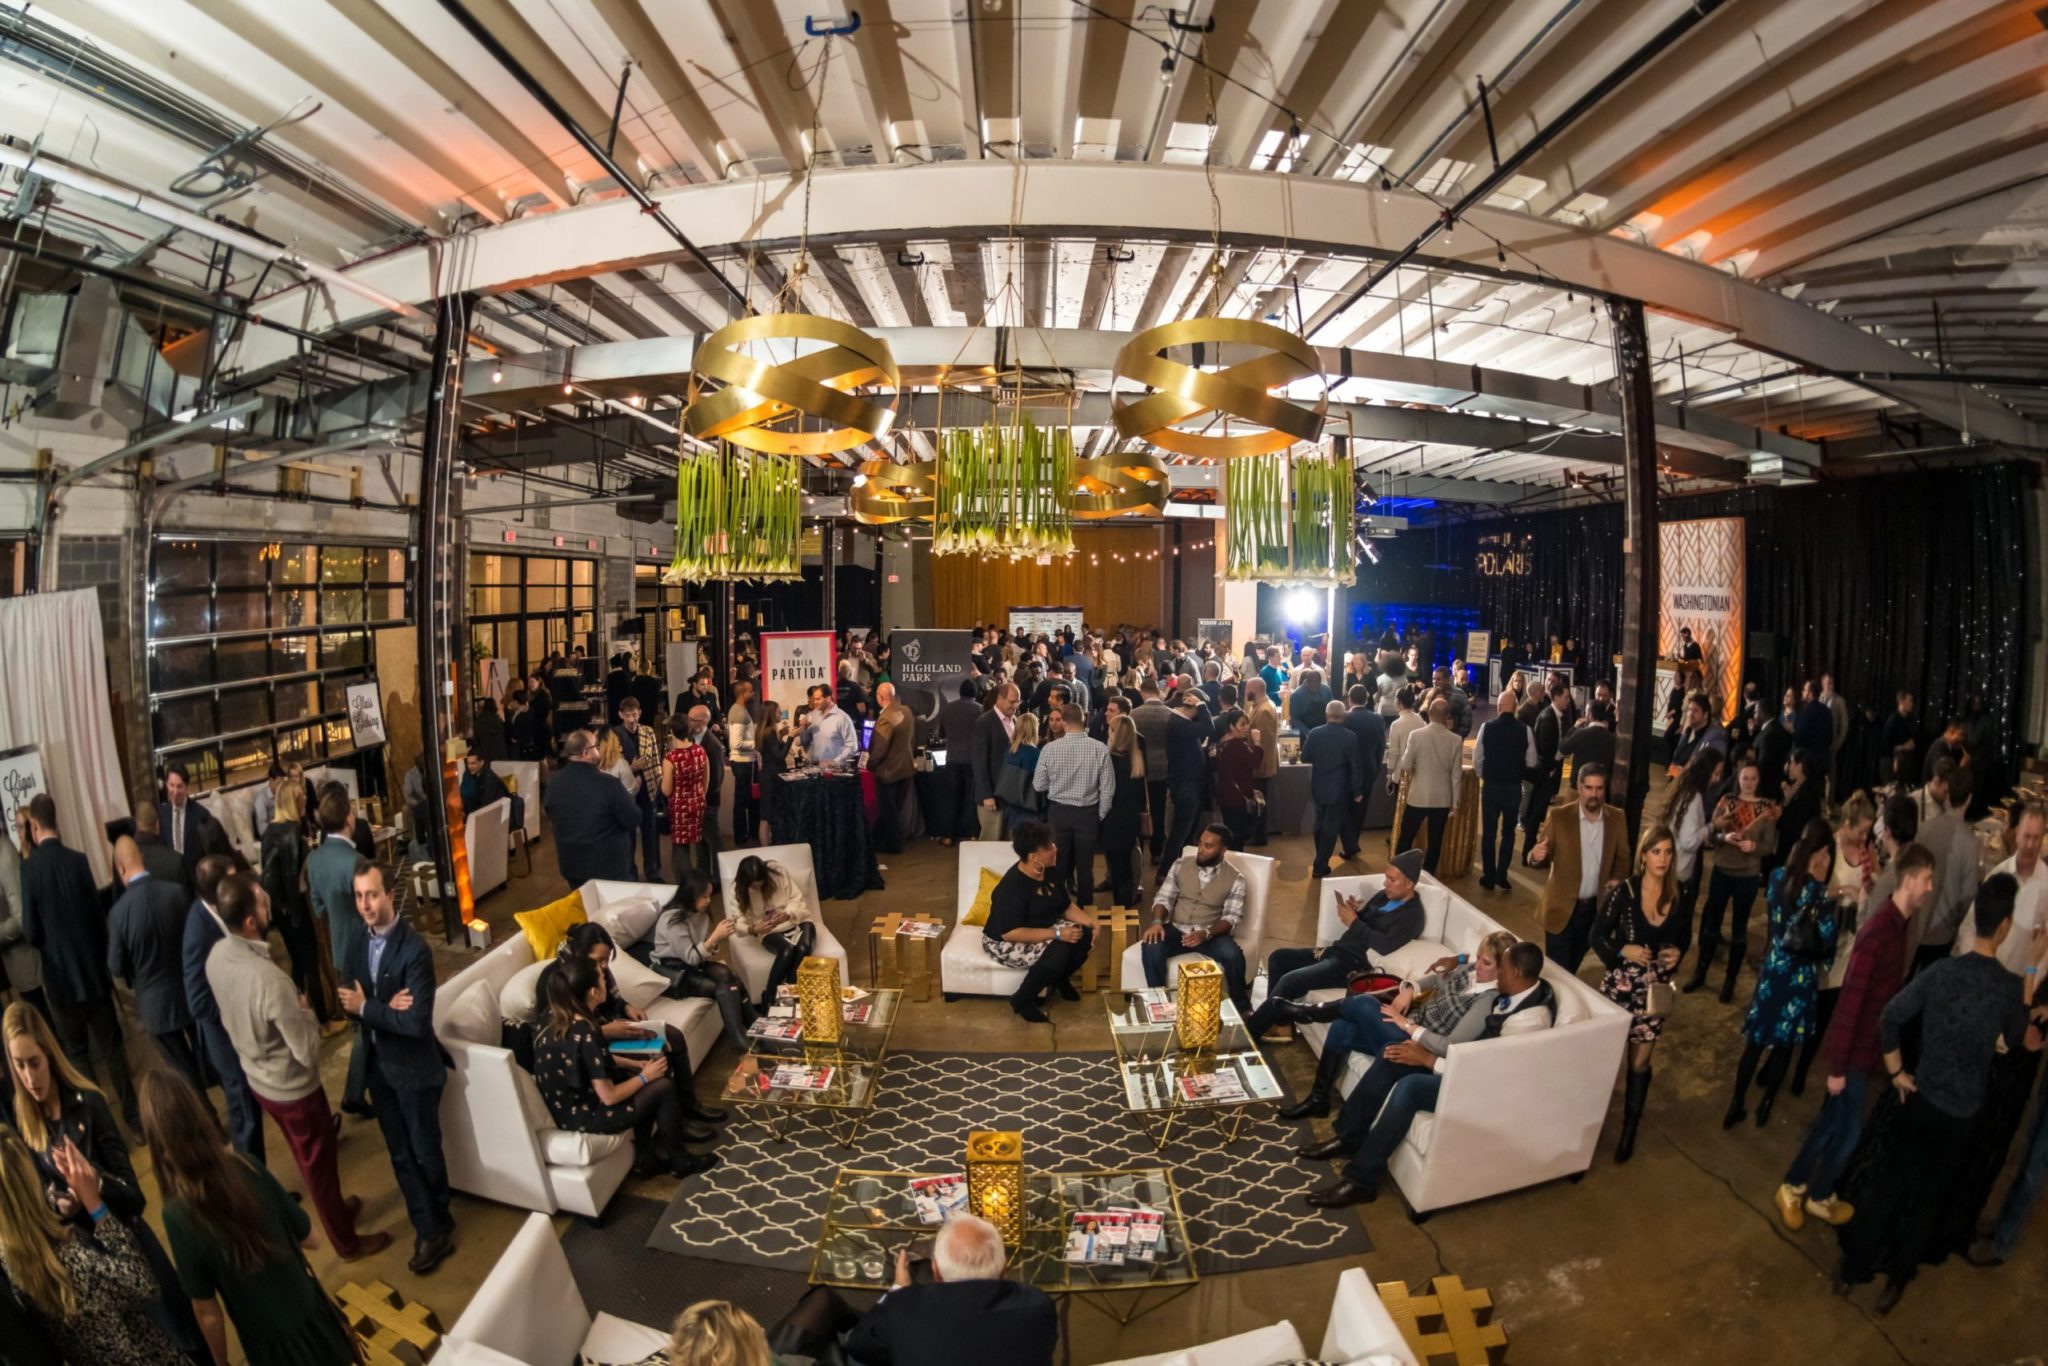 Photos from Washingtonian's 2018 Whiskey & Fine Spirits Festival